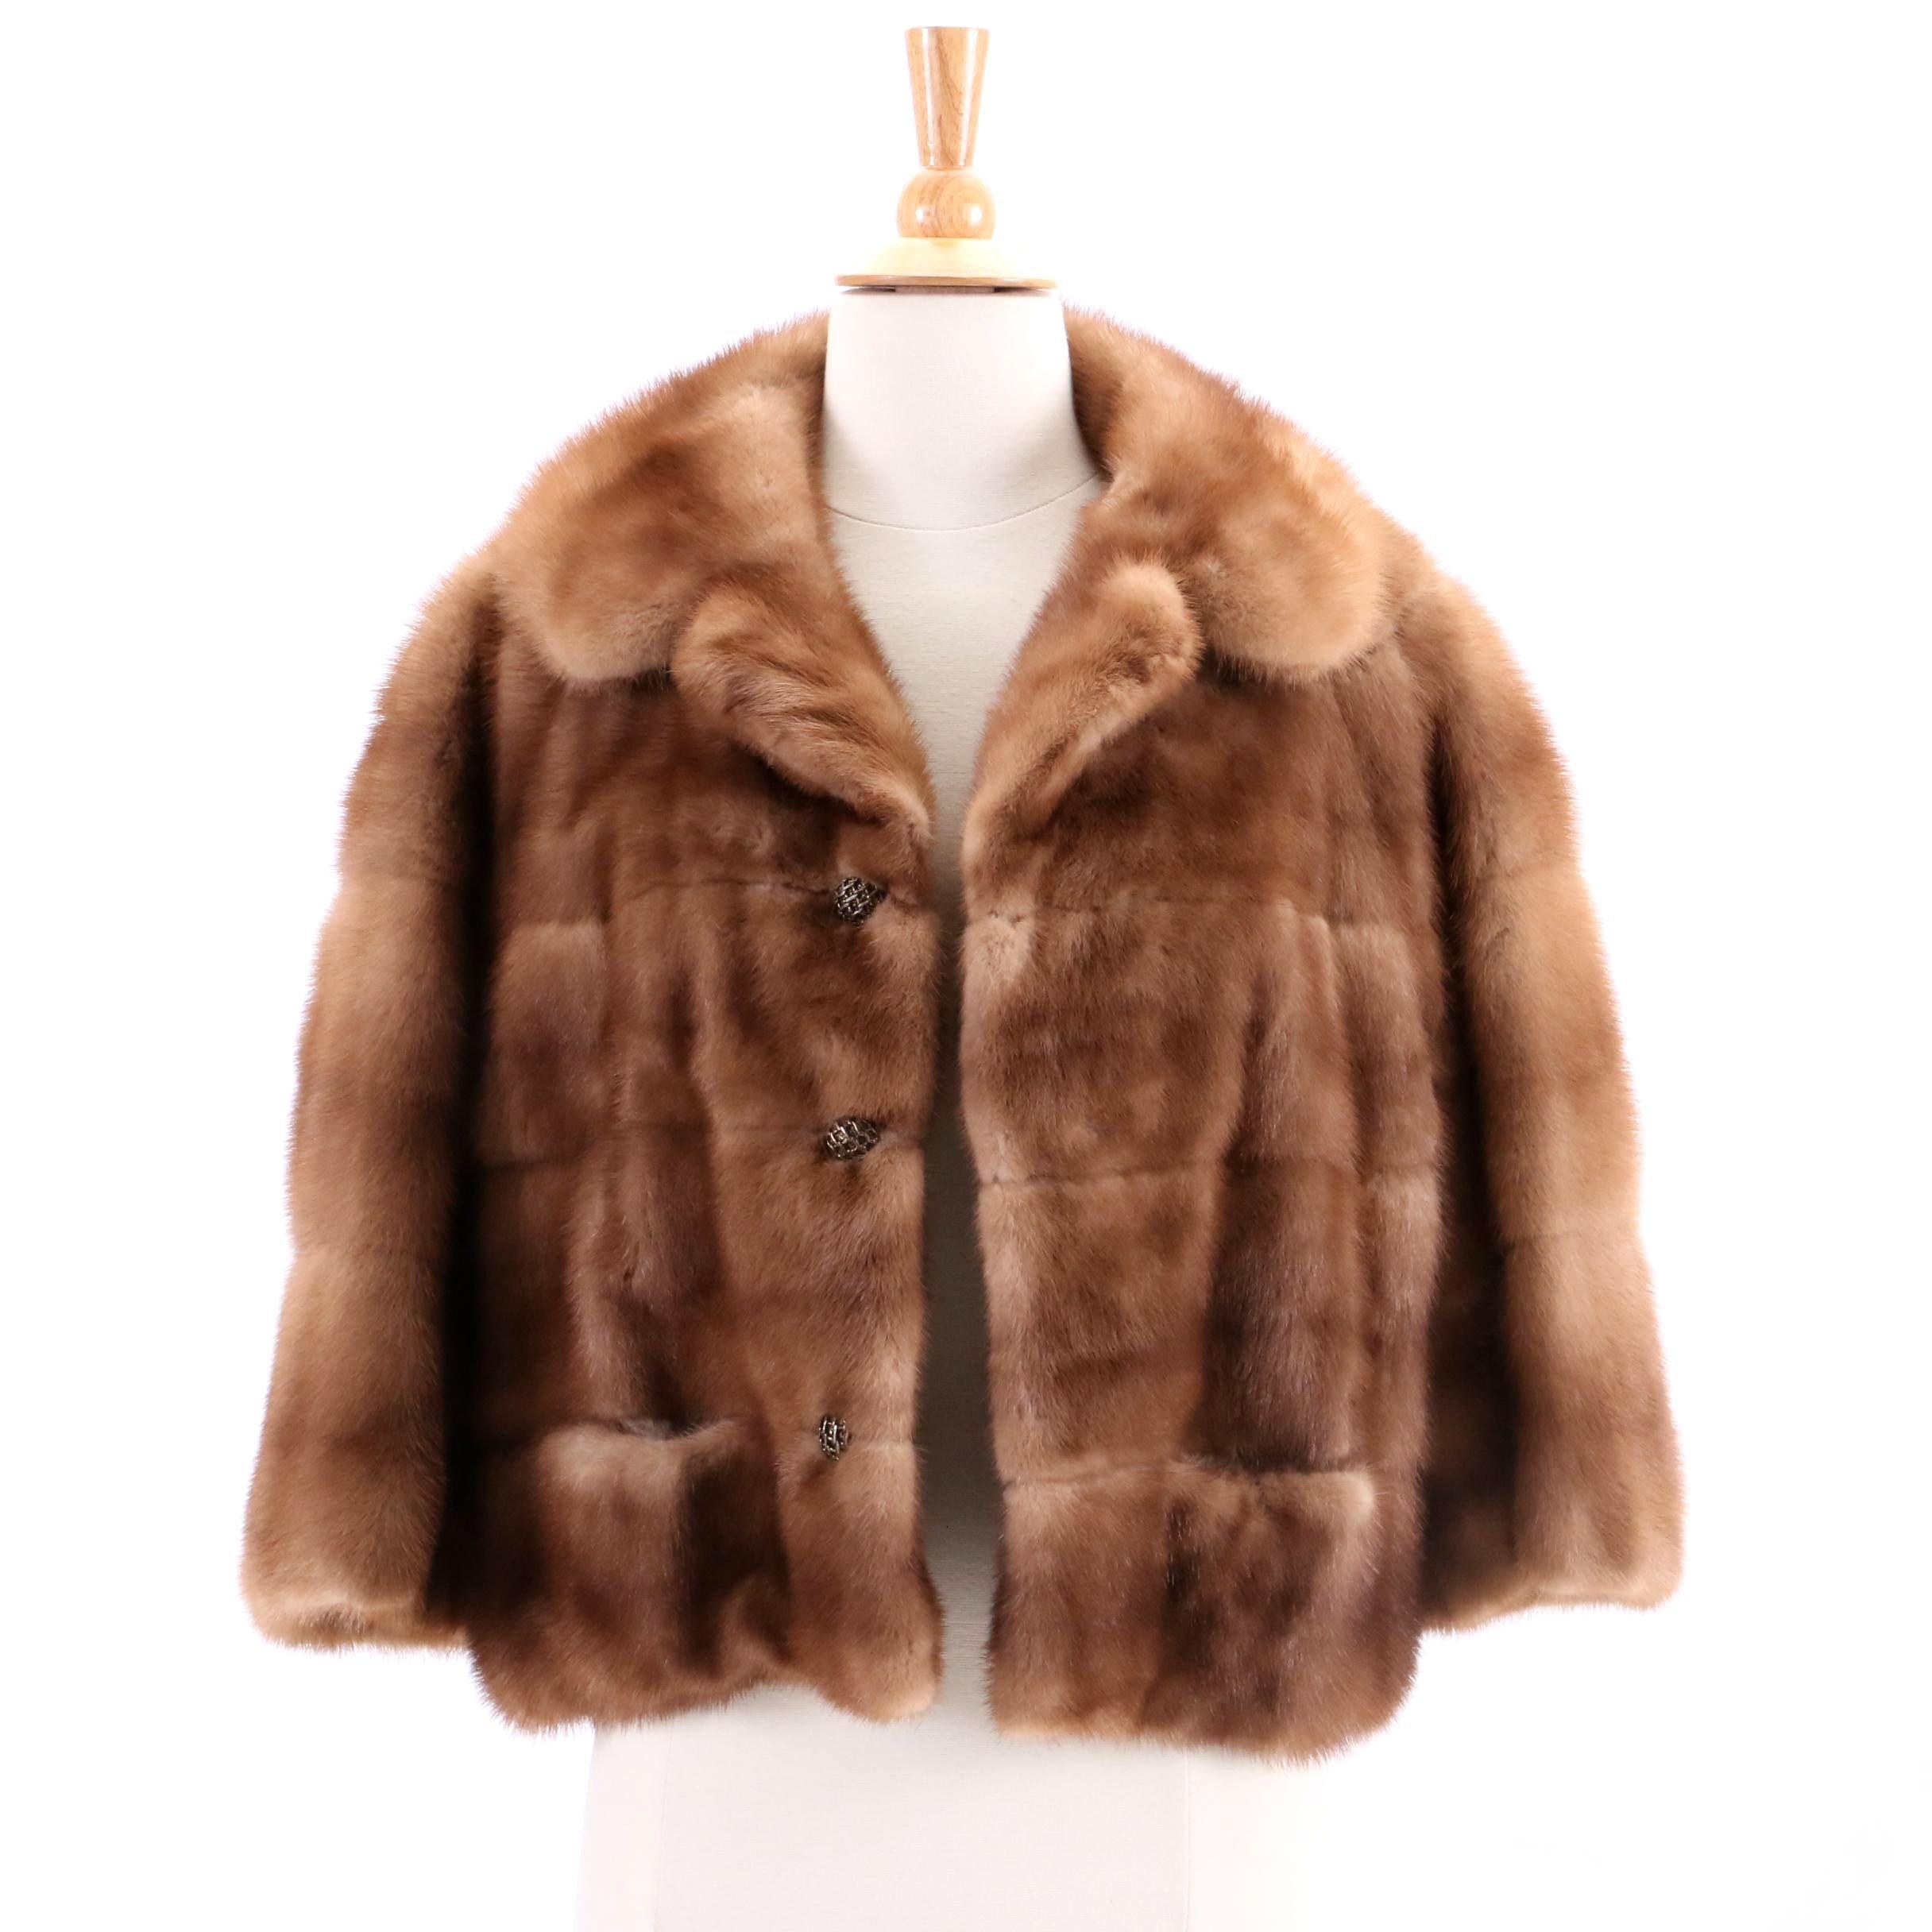 Vintage Heimann's Mink Fur Coat